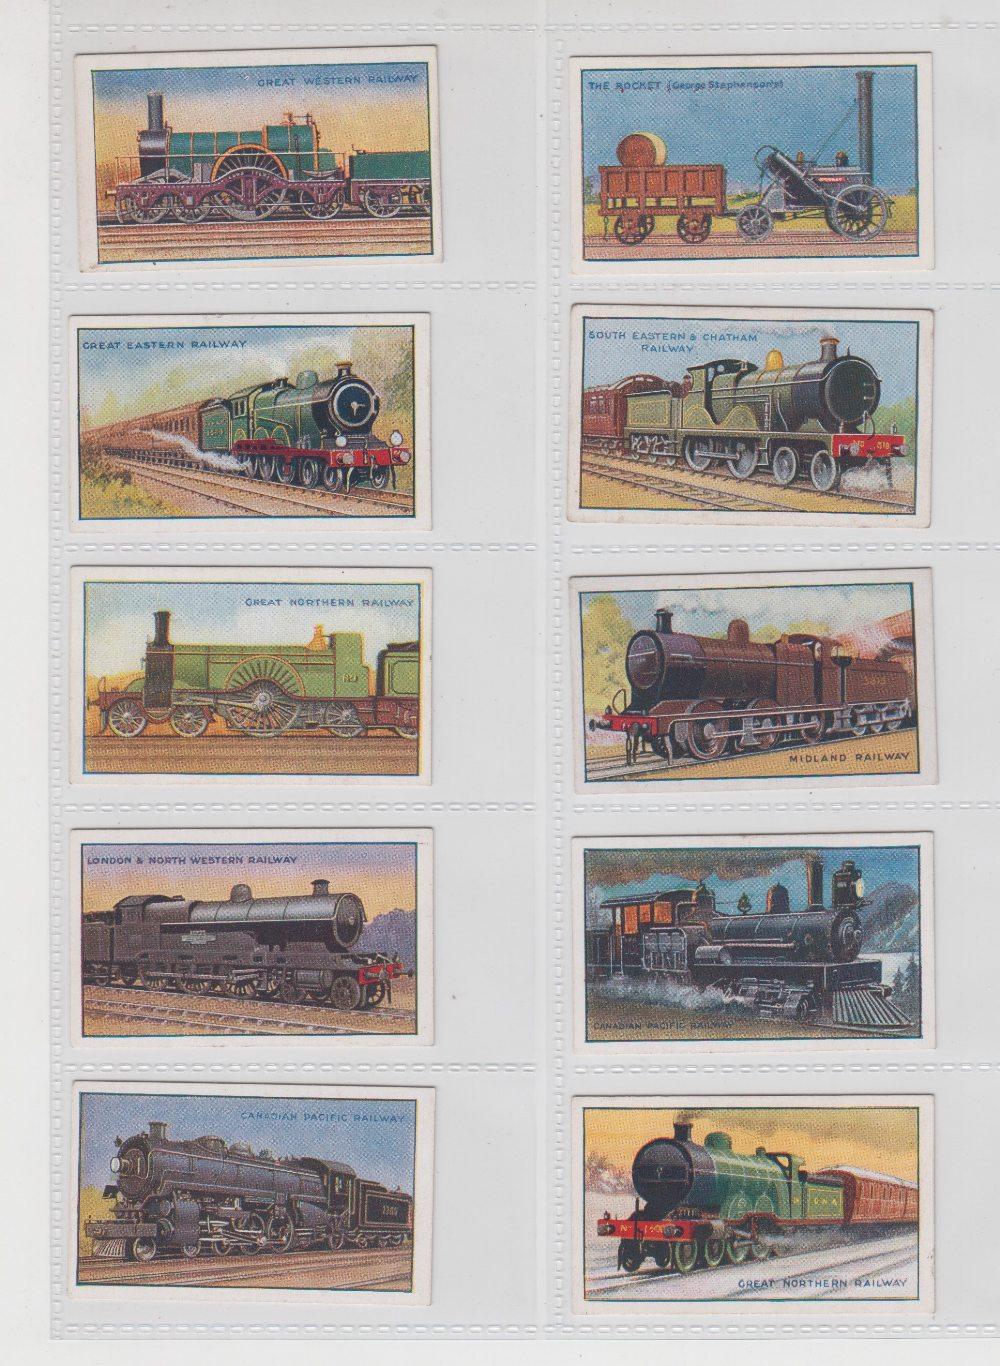 Lot 215 - Cigarette cards, Phillip's, Railway Engines (set, 25 cards) (gd/vg)